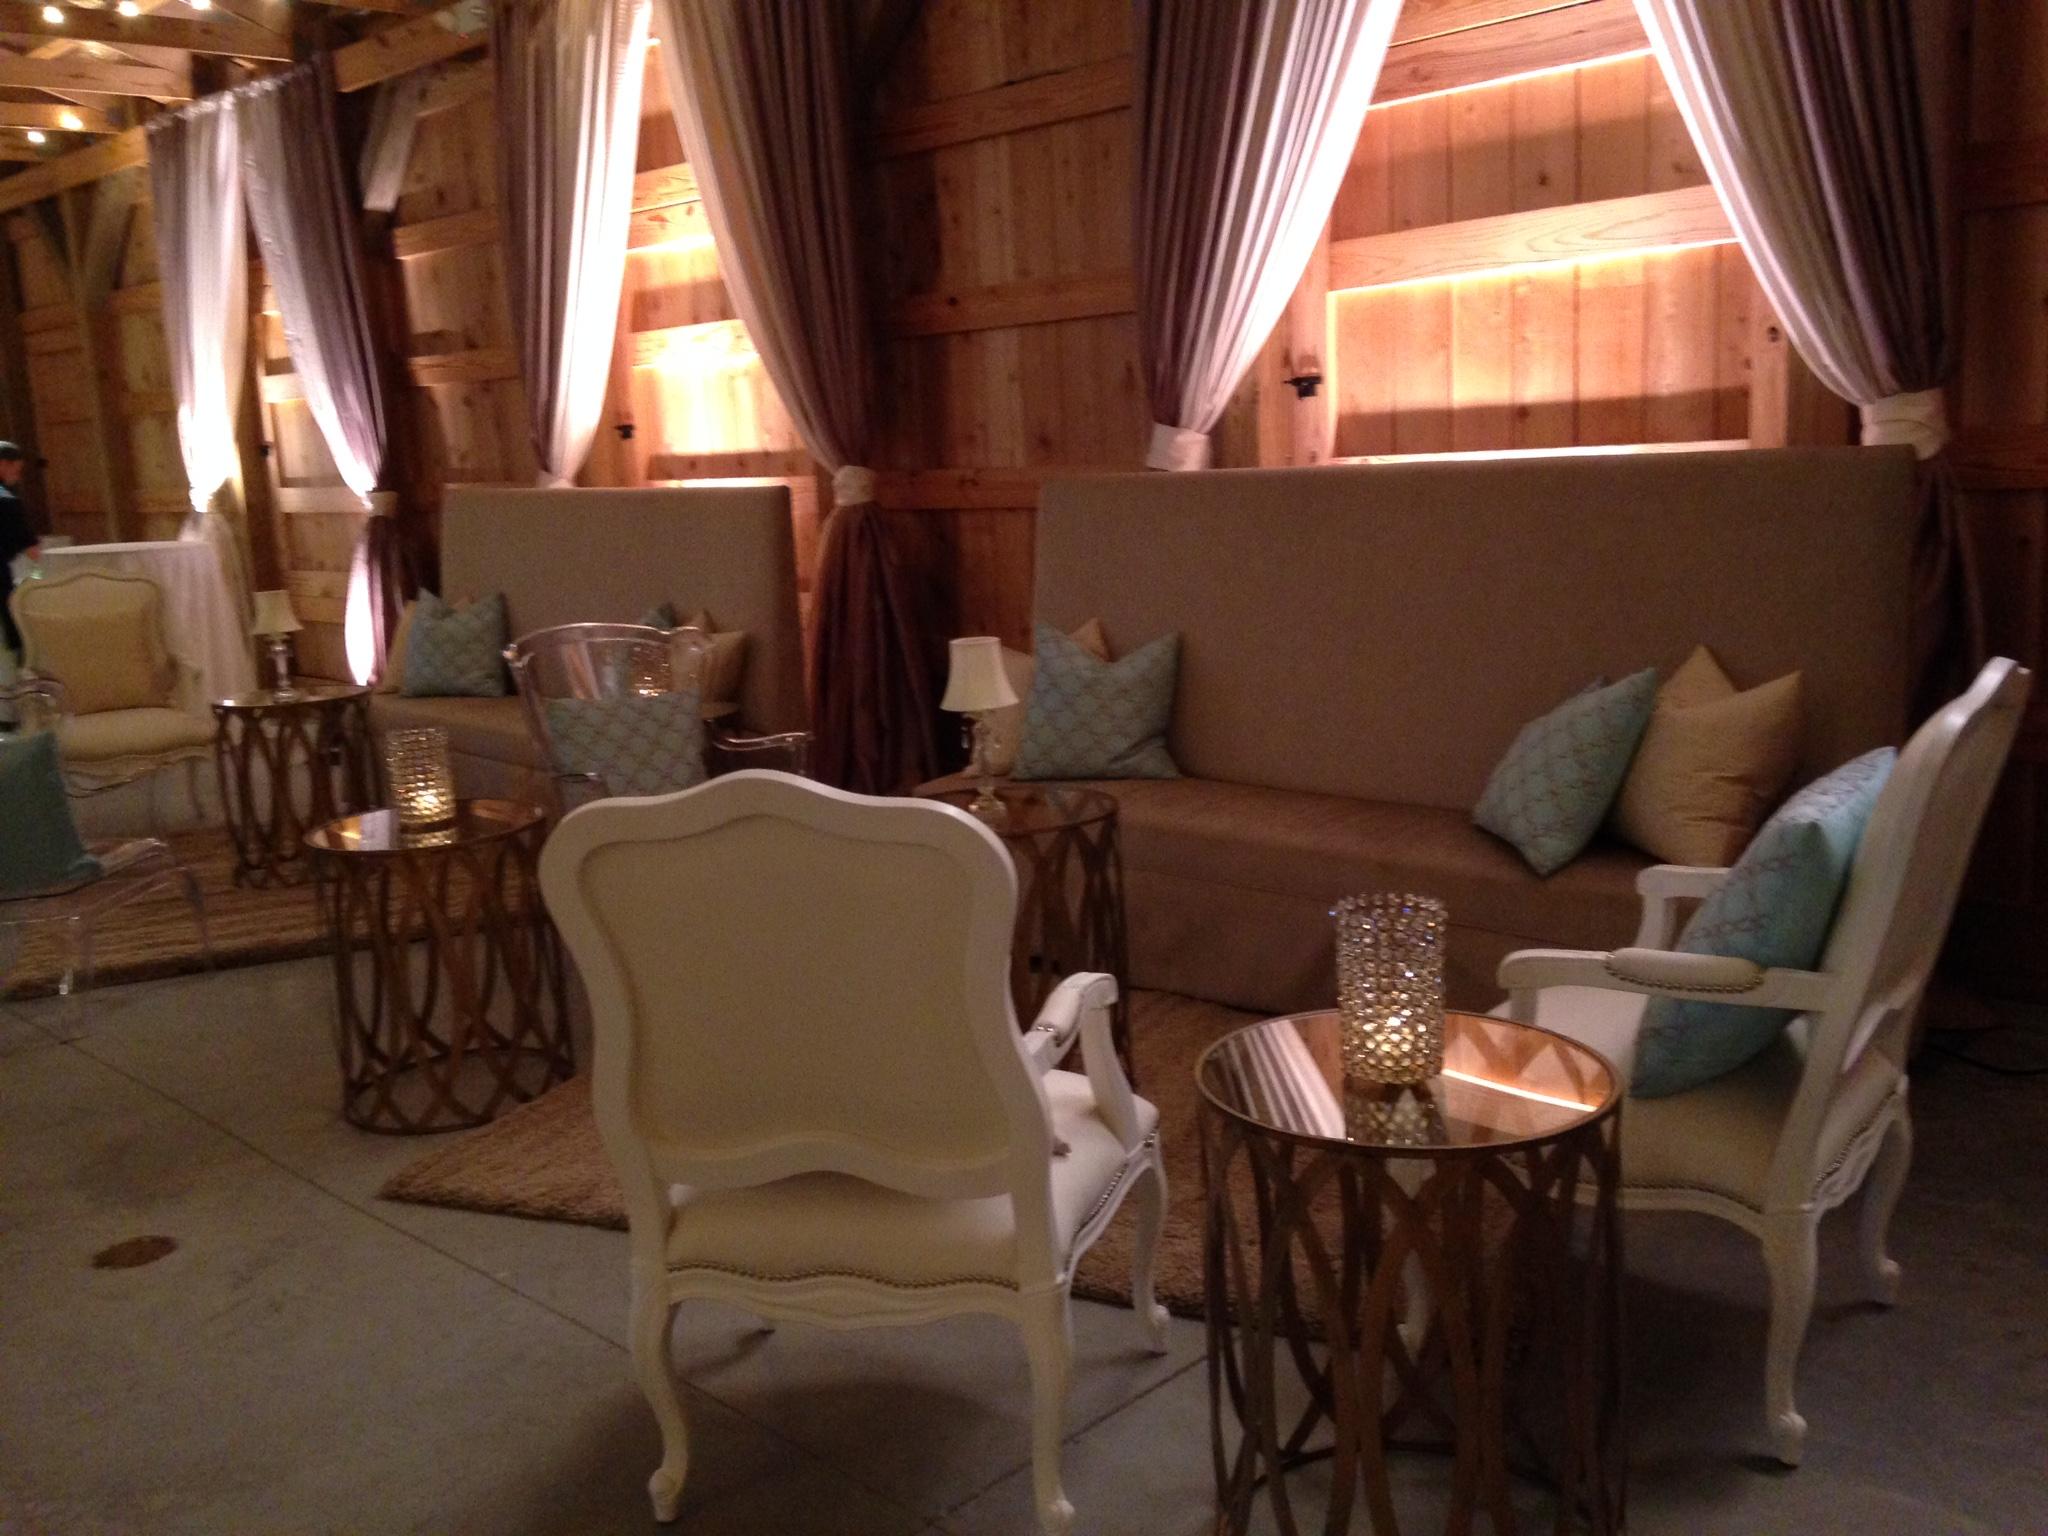 Saddlewoodsfarm-nashville-wedding-barn